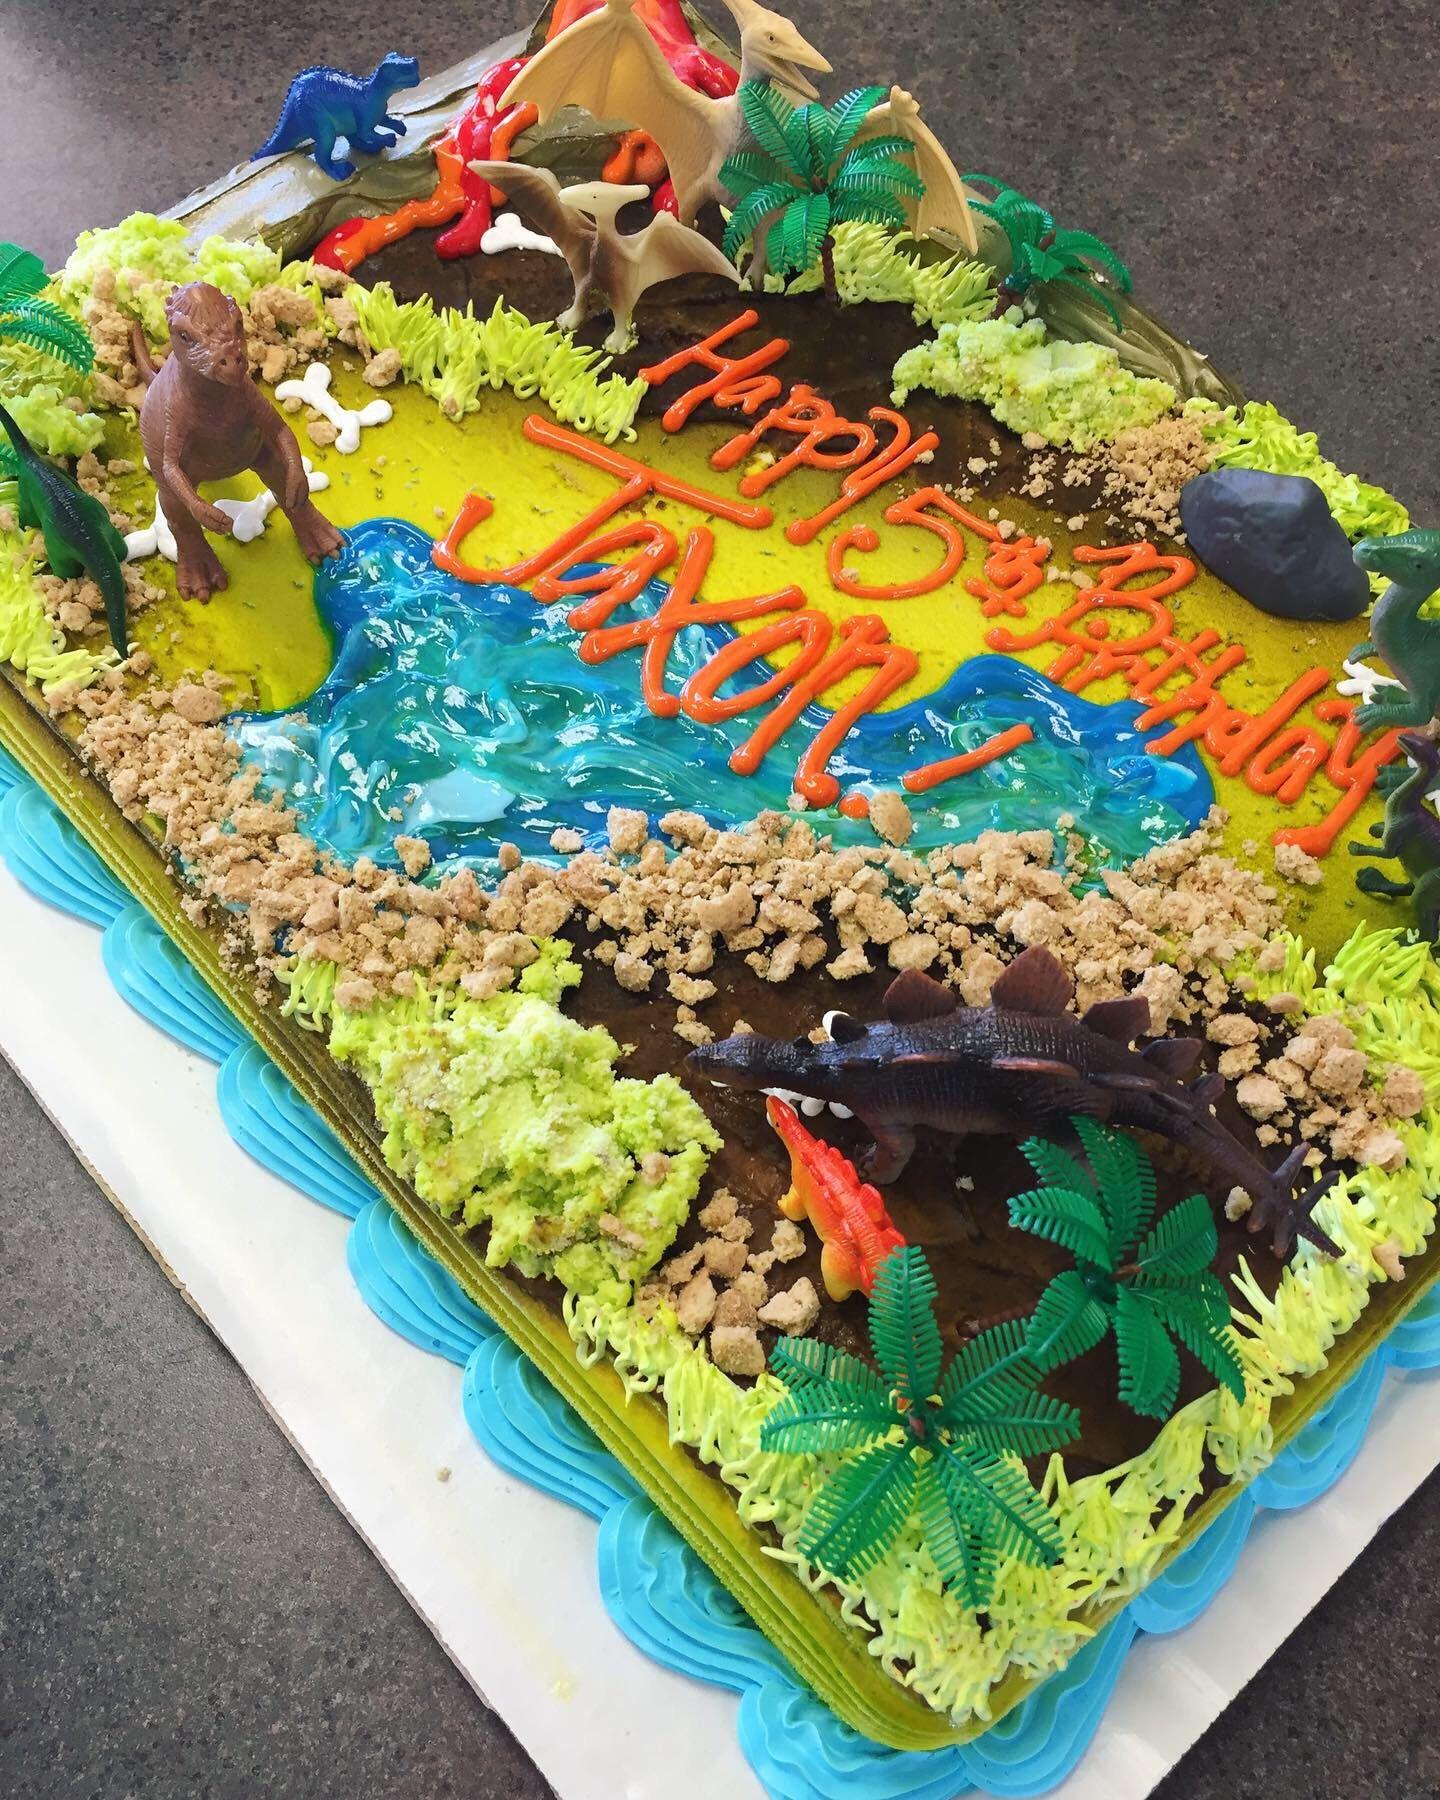 Dinosaur dairy queen sheet cake by kelsey scott mason